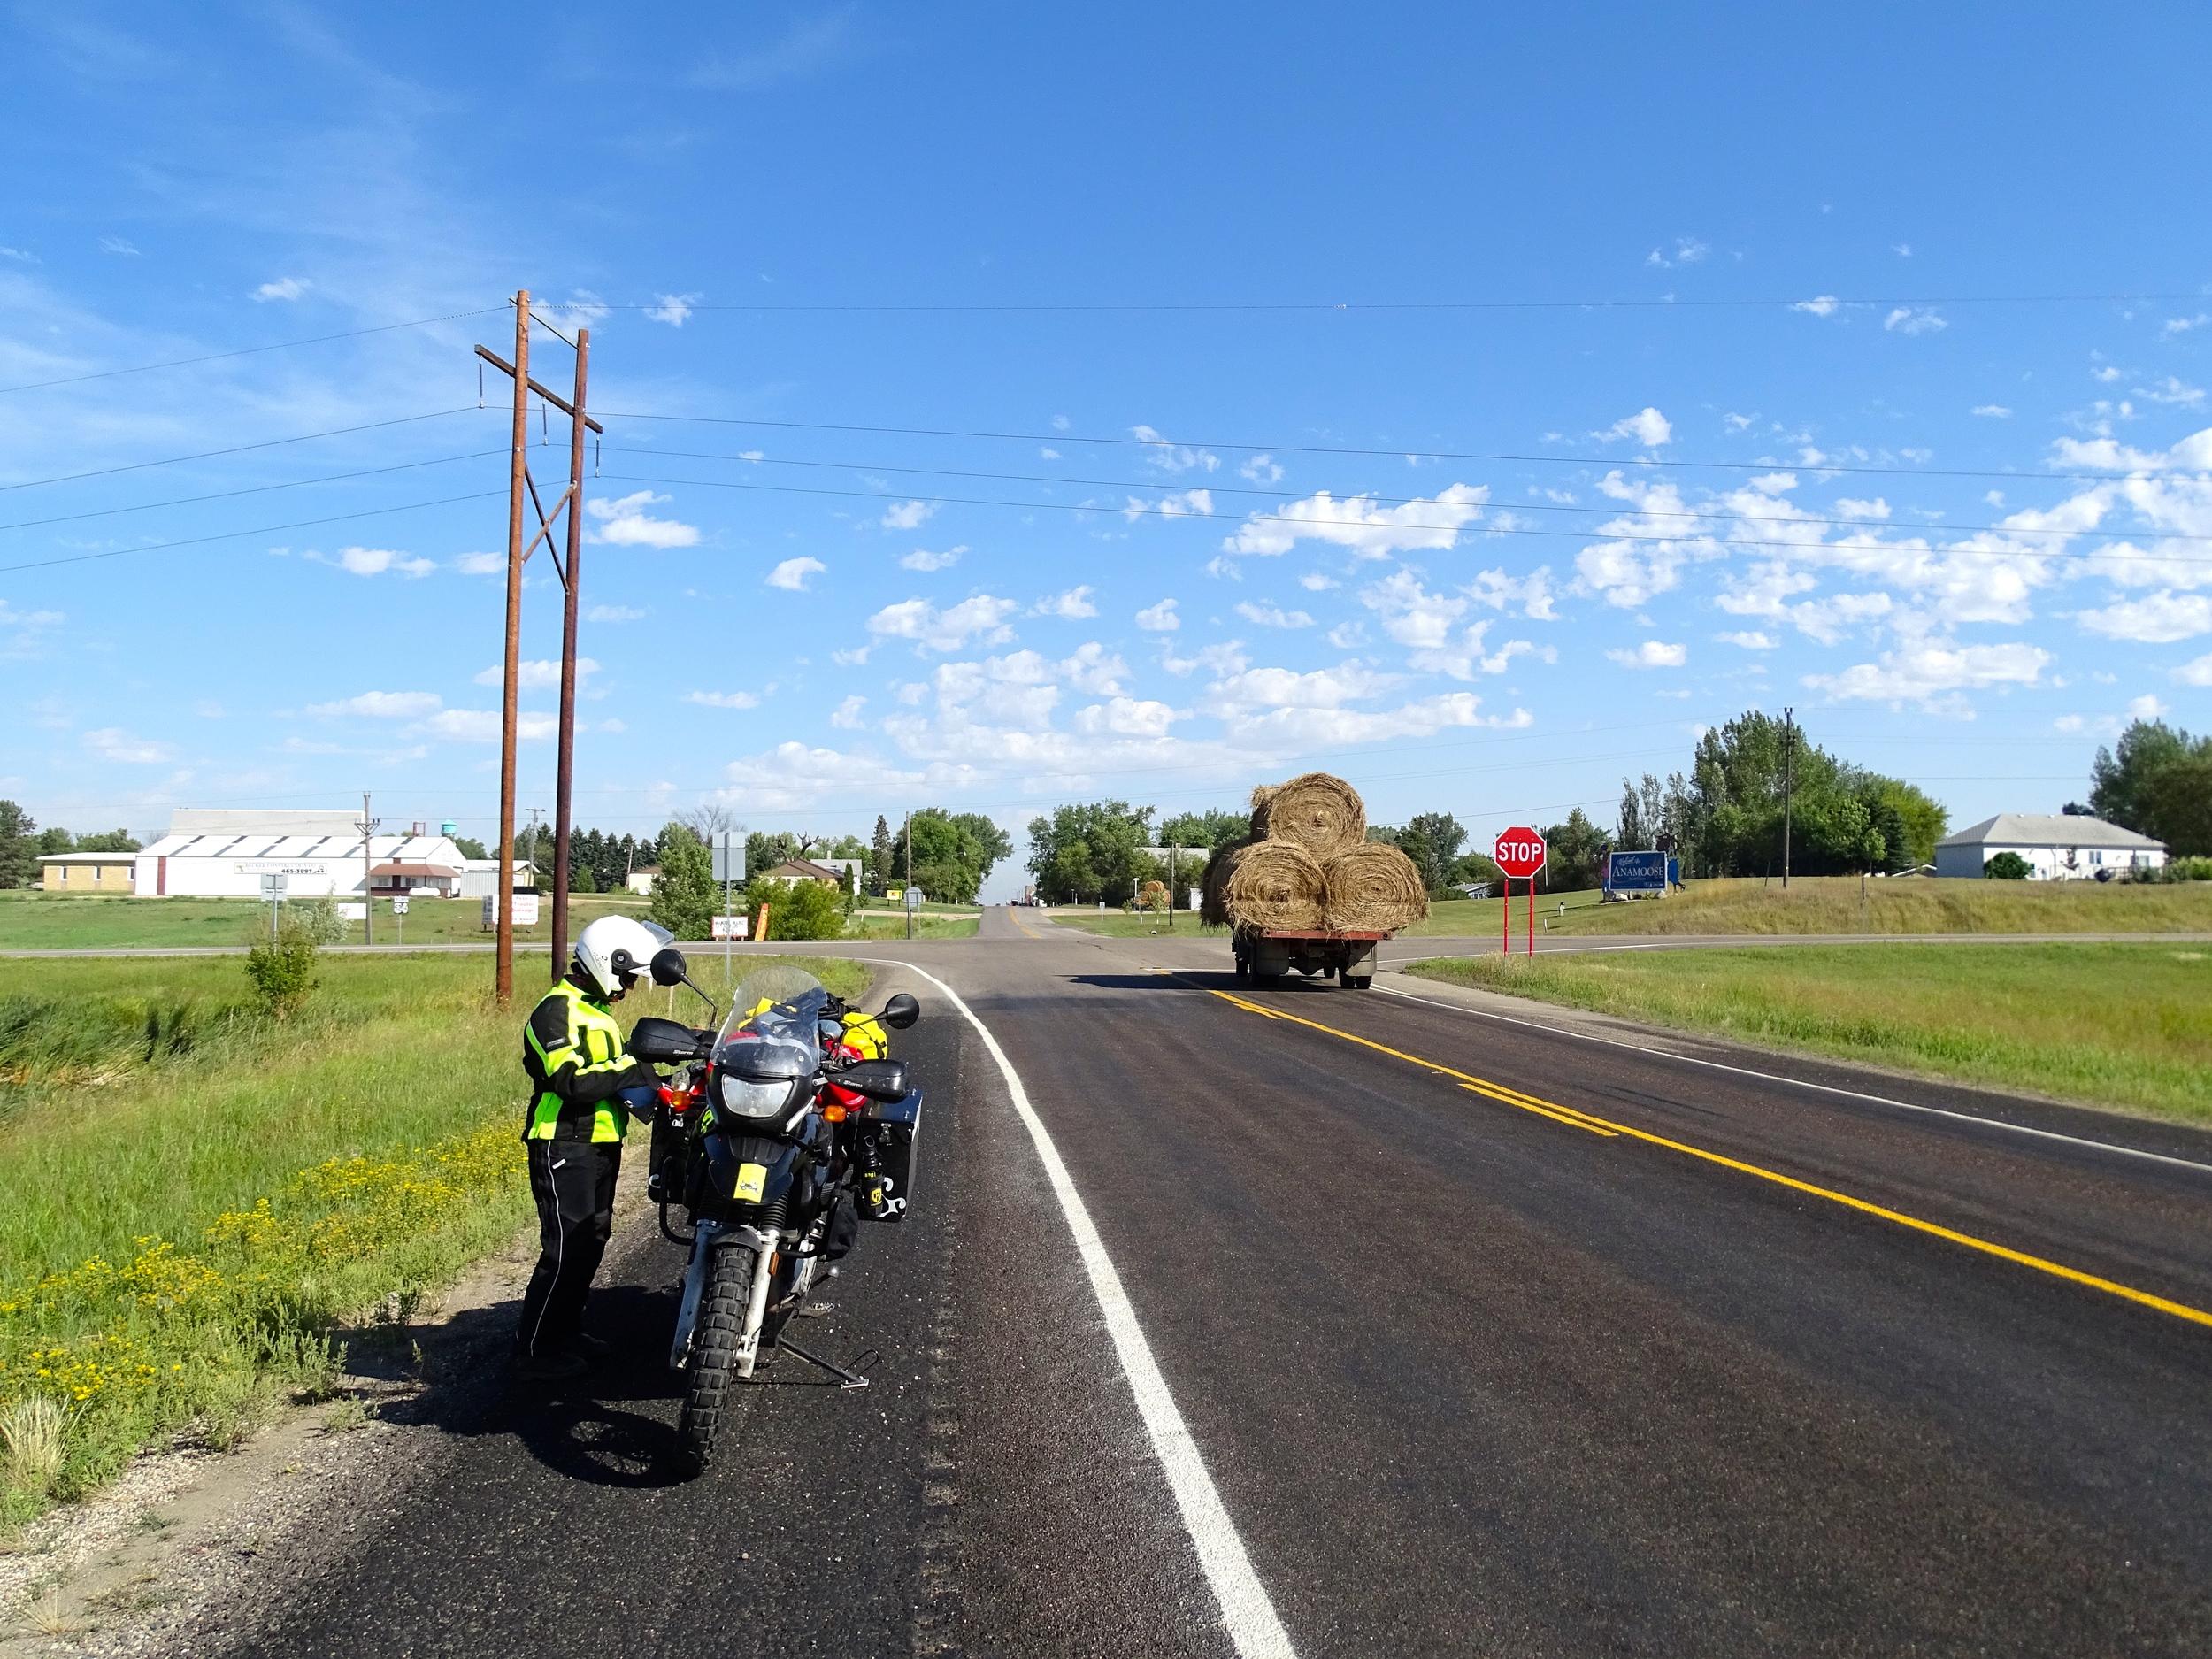 On the road toward Minnesota.